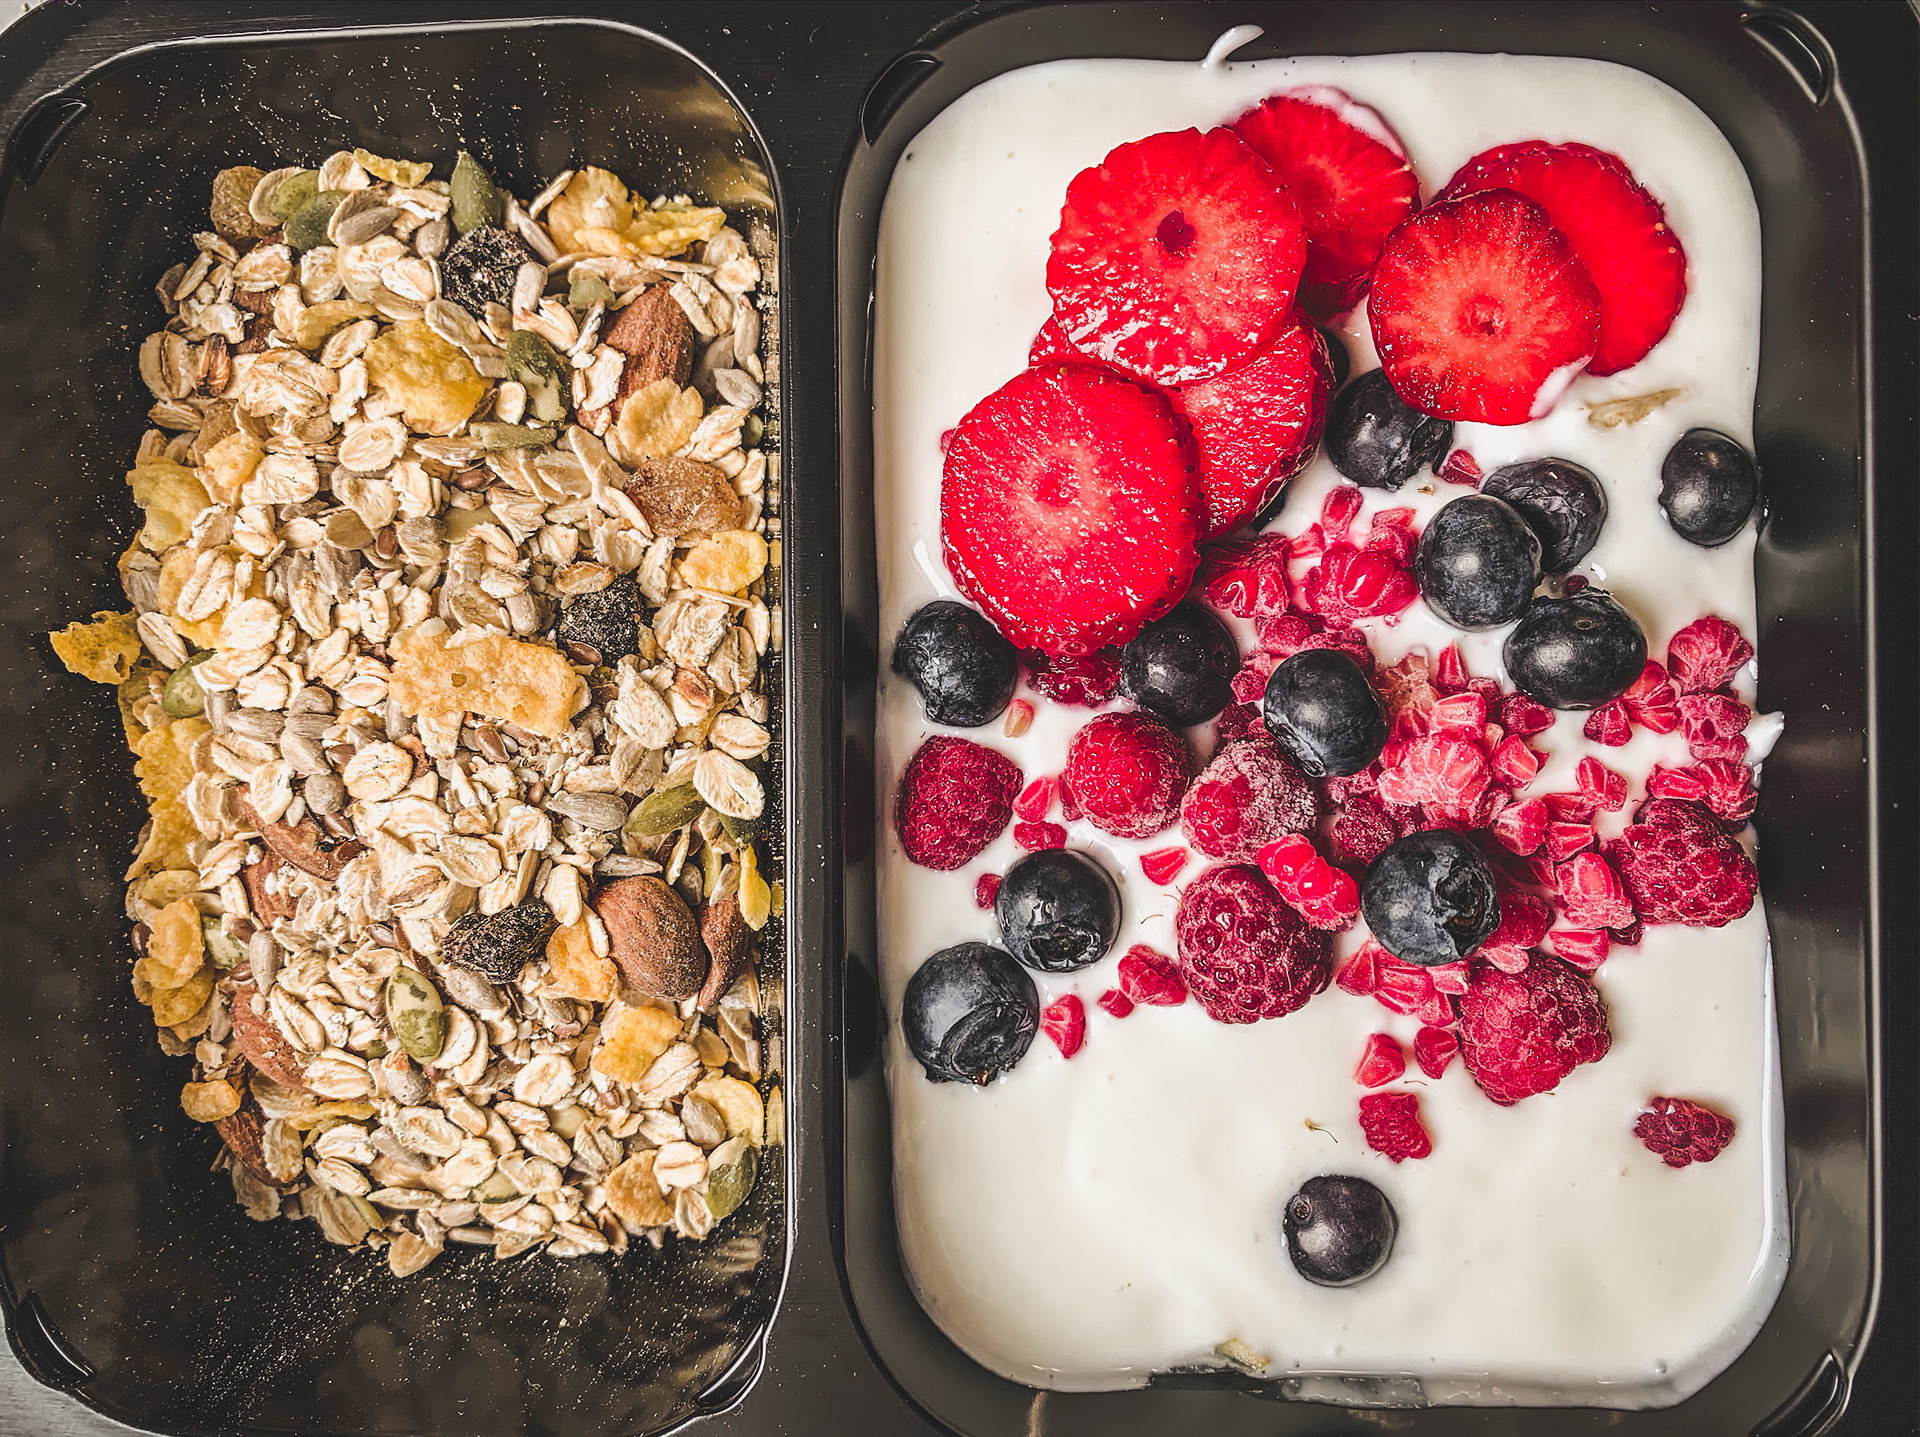 Obrazek Dieta bez glutenu i laktozy na 20 dni 1200 kalorii